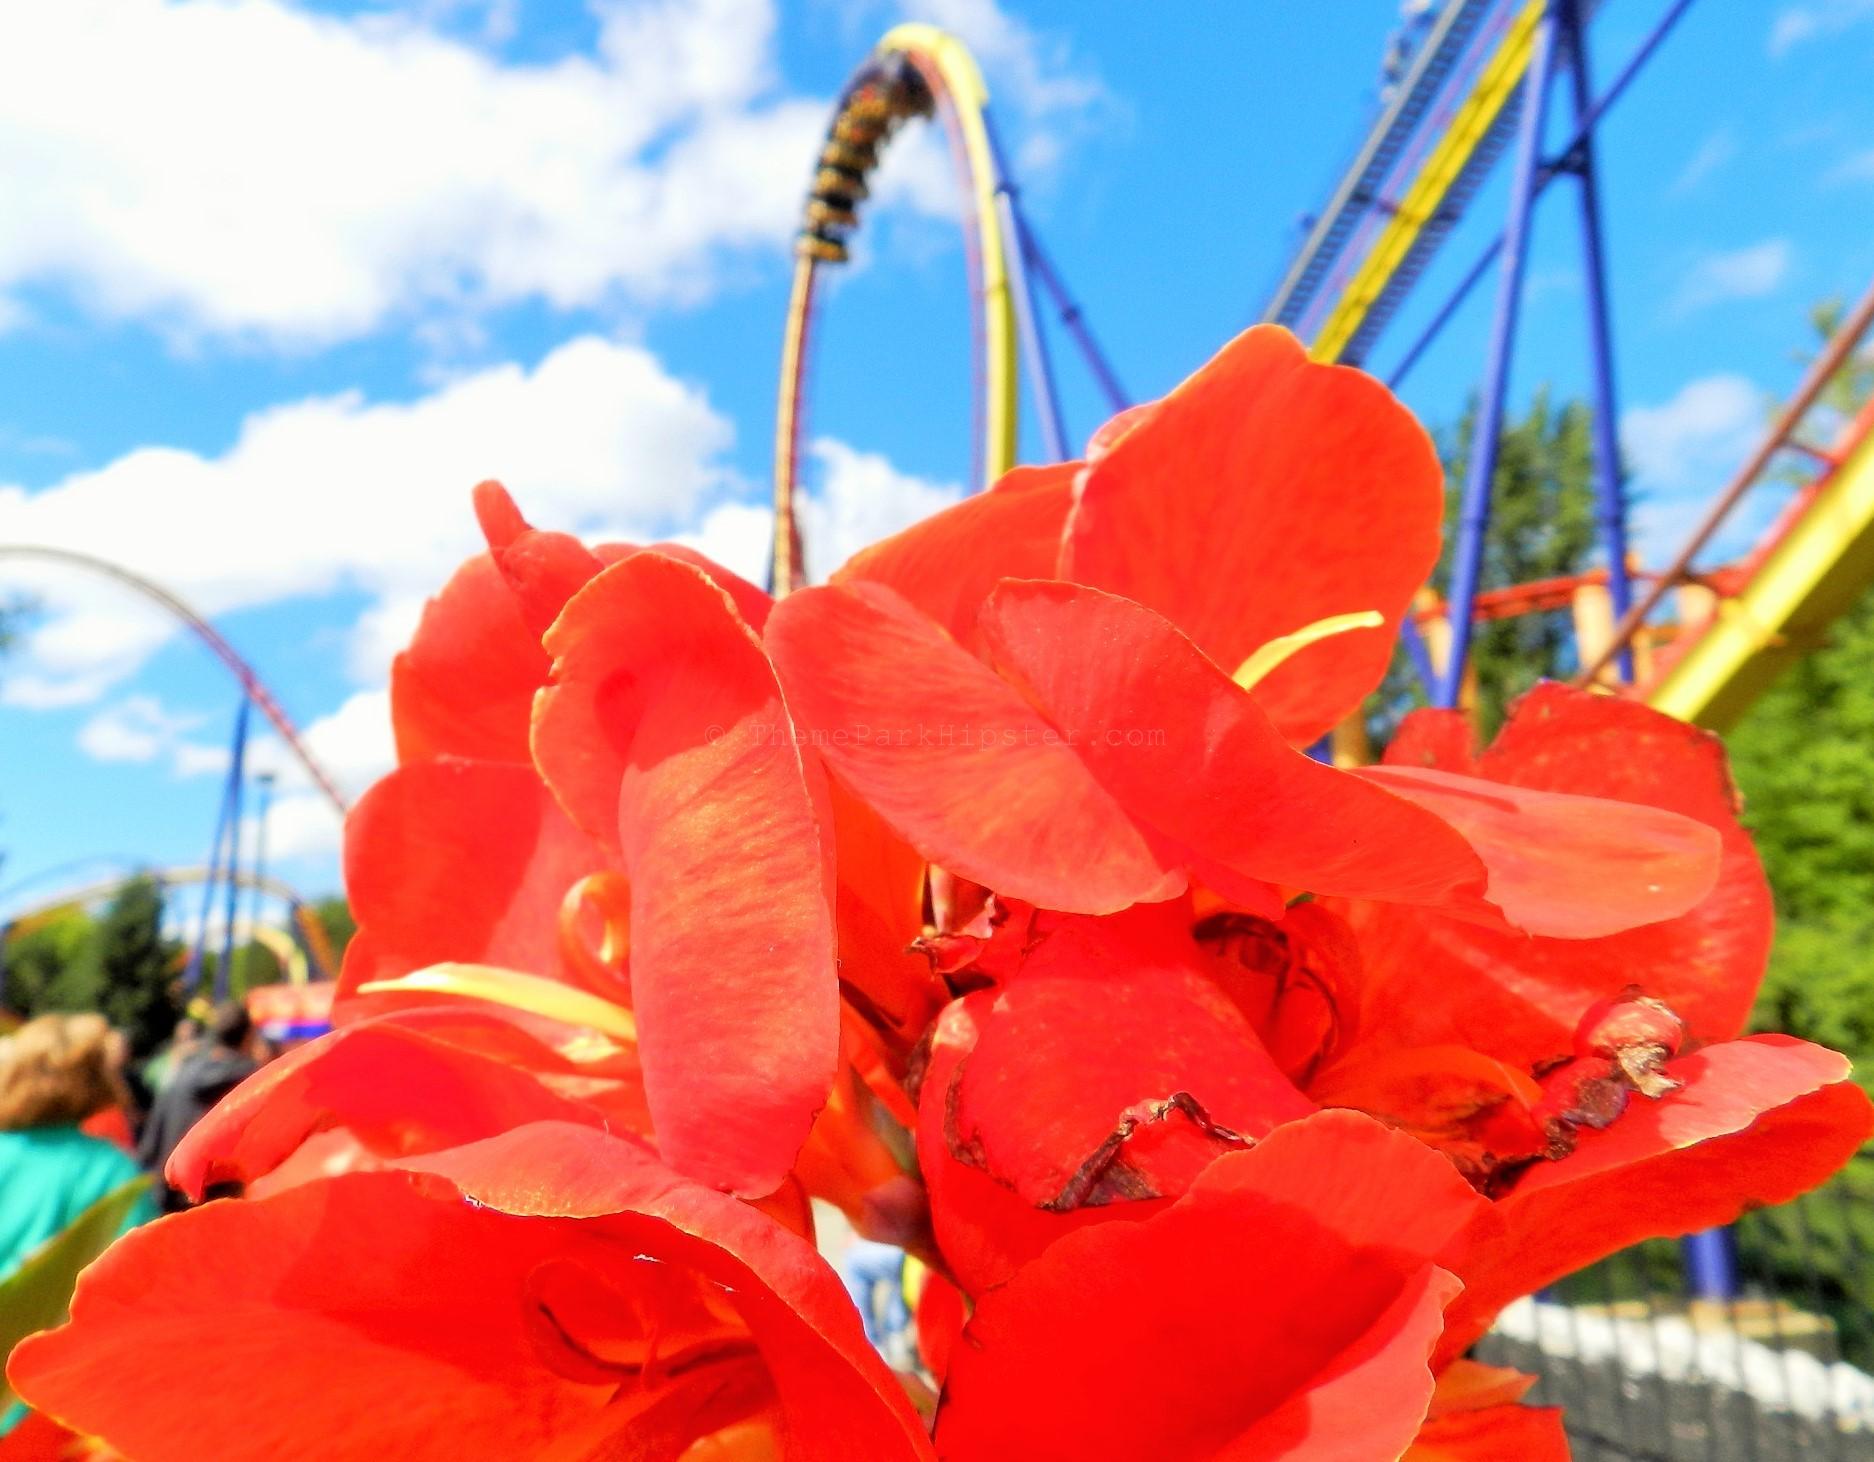 The Mantis at Cedar Point